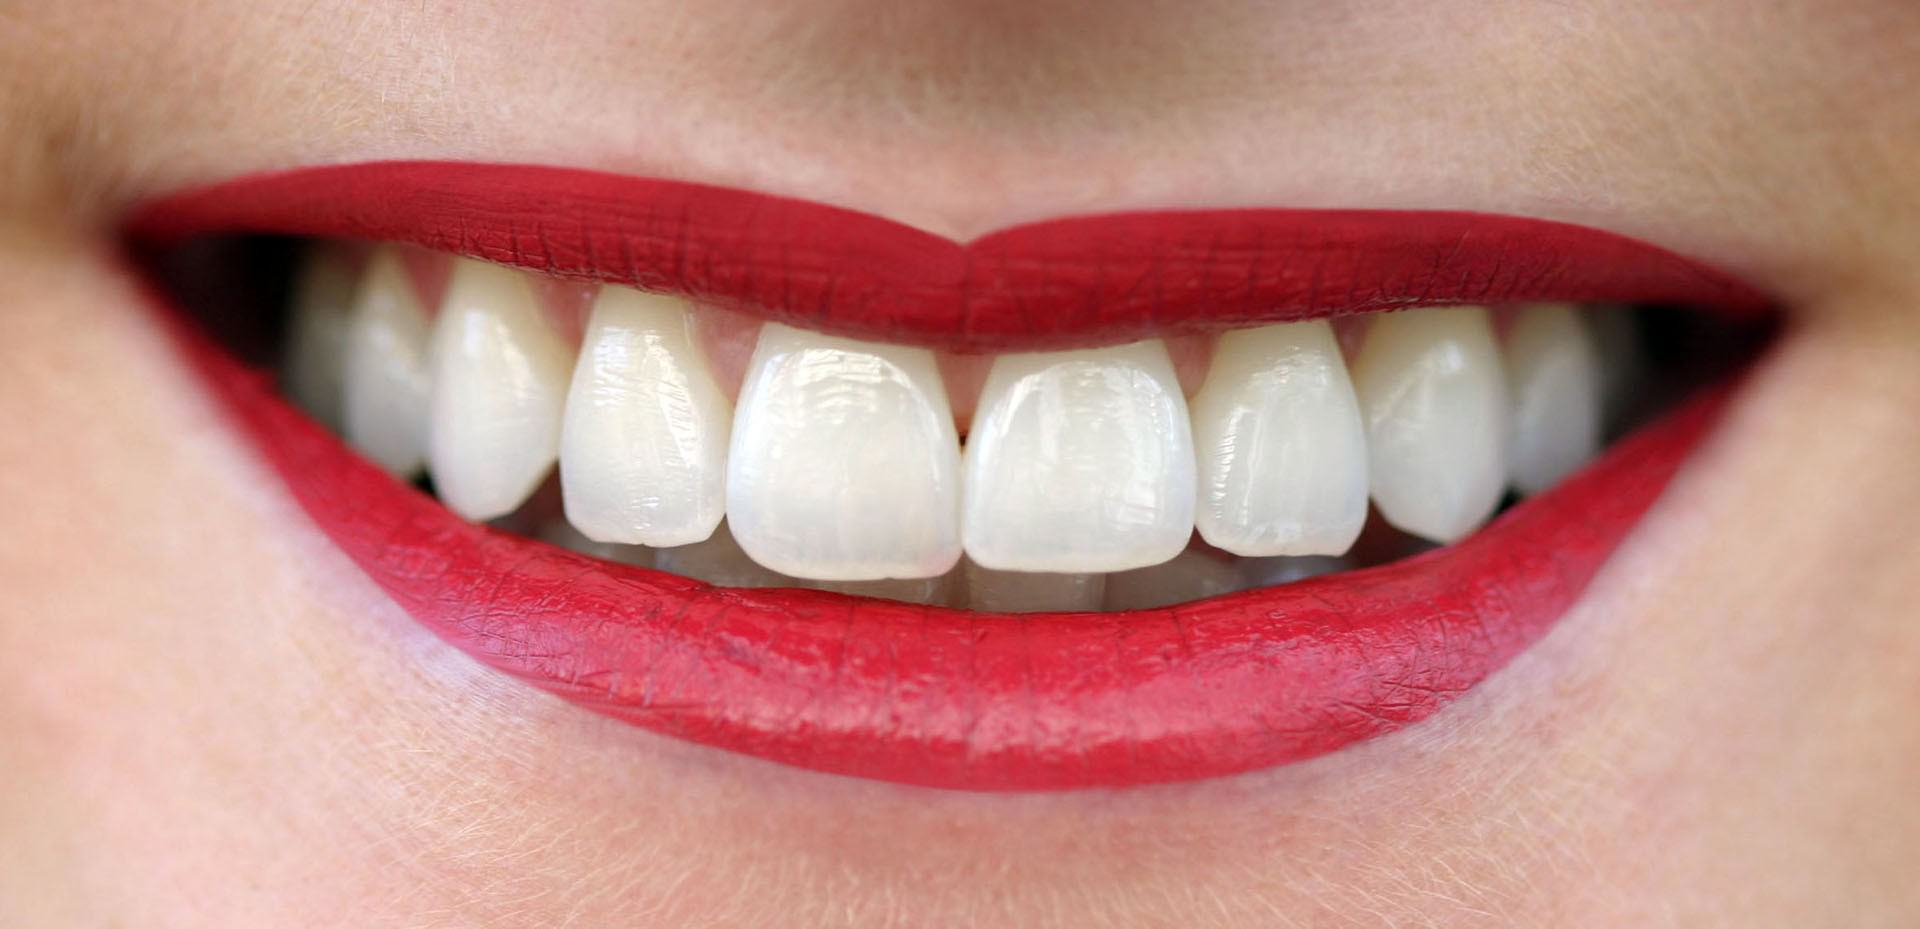 Zahnkultur Köln - Ein strahlendes Lächeln